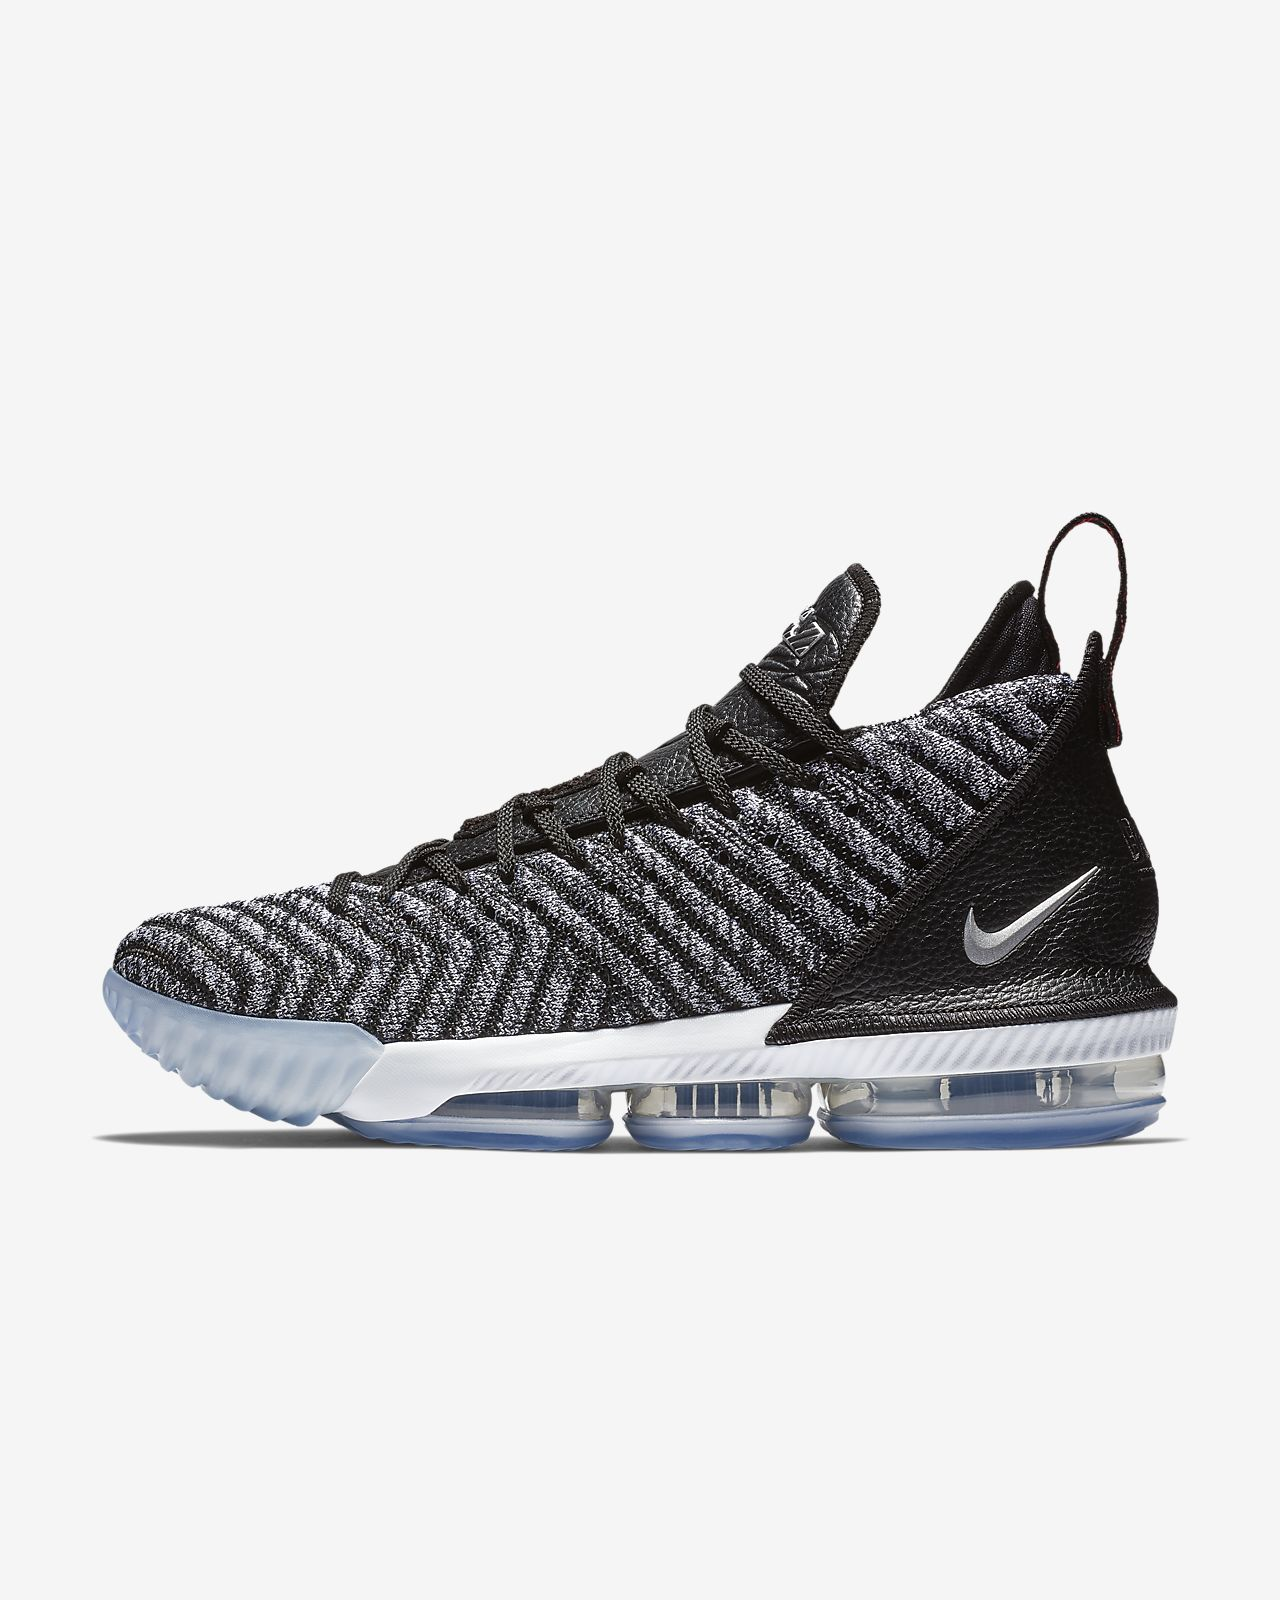 Análisis Nike Lebron 16 ¿A la altura de las 15? | Blog 24